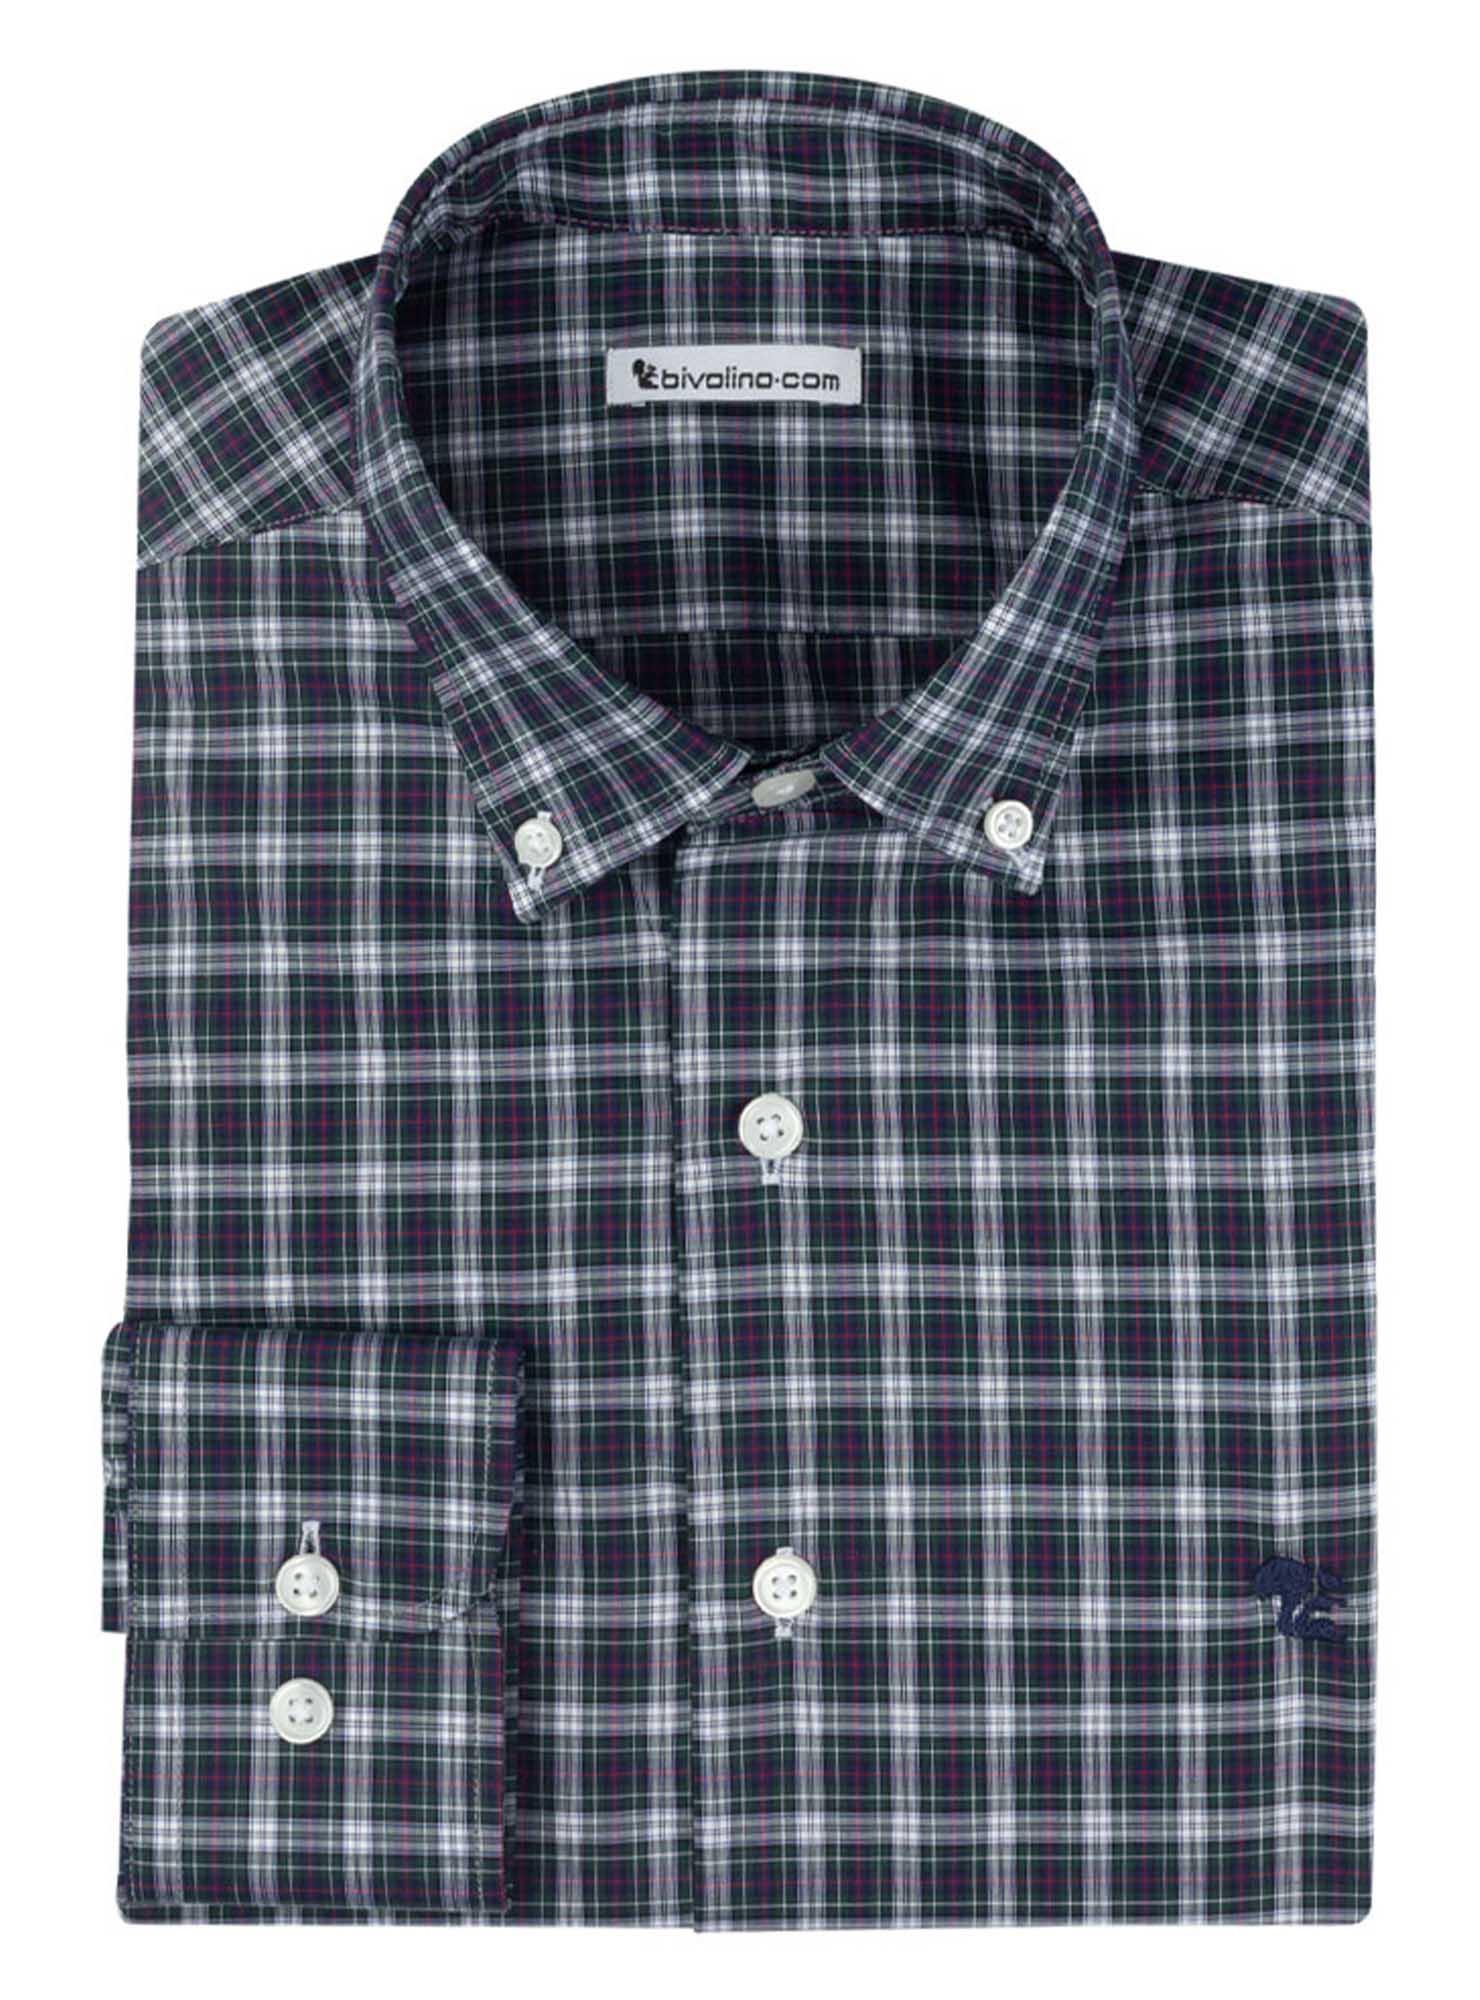 LENCLA - Männerhemd Baumwolle  zephyr - SCOTT 1